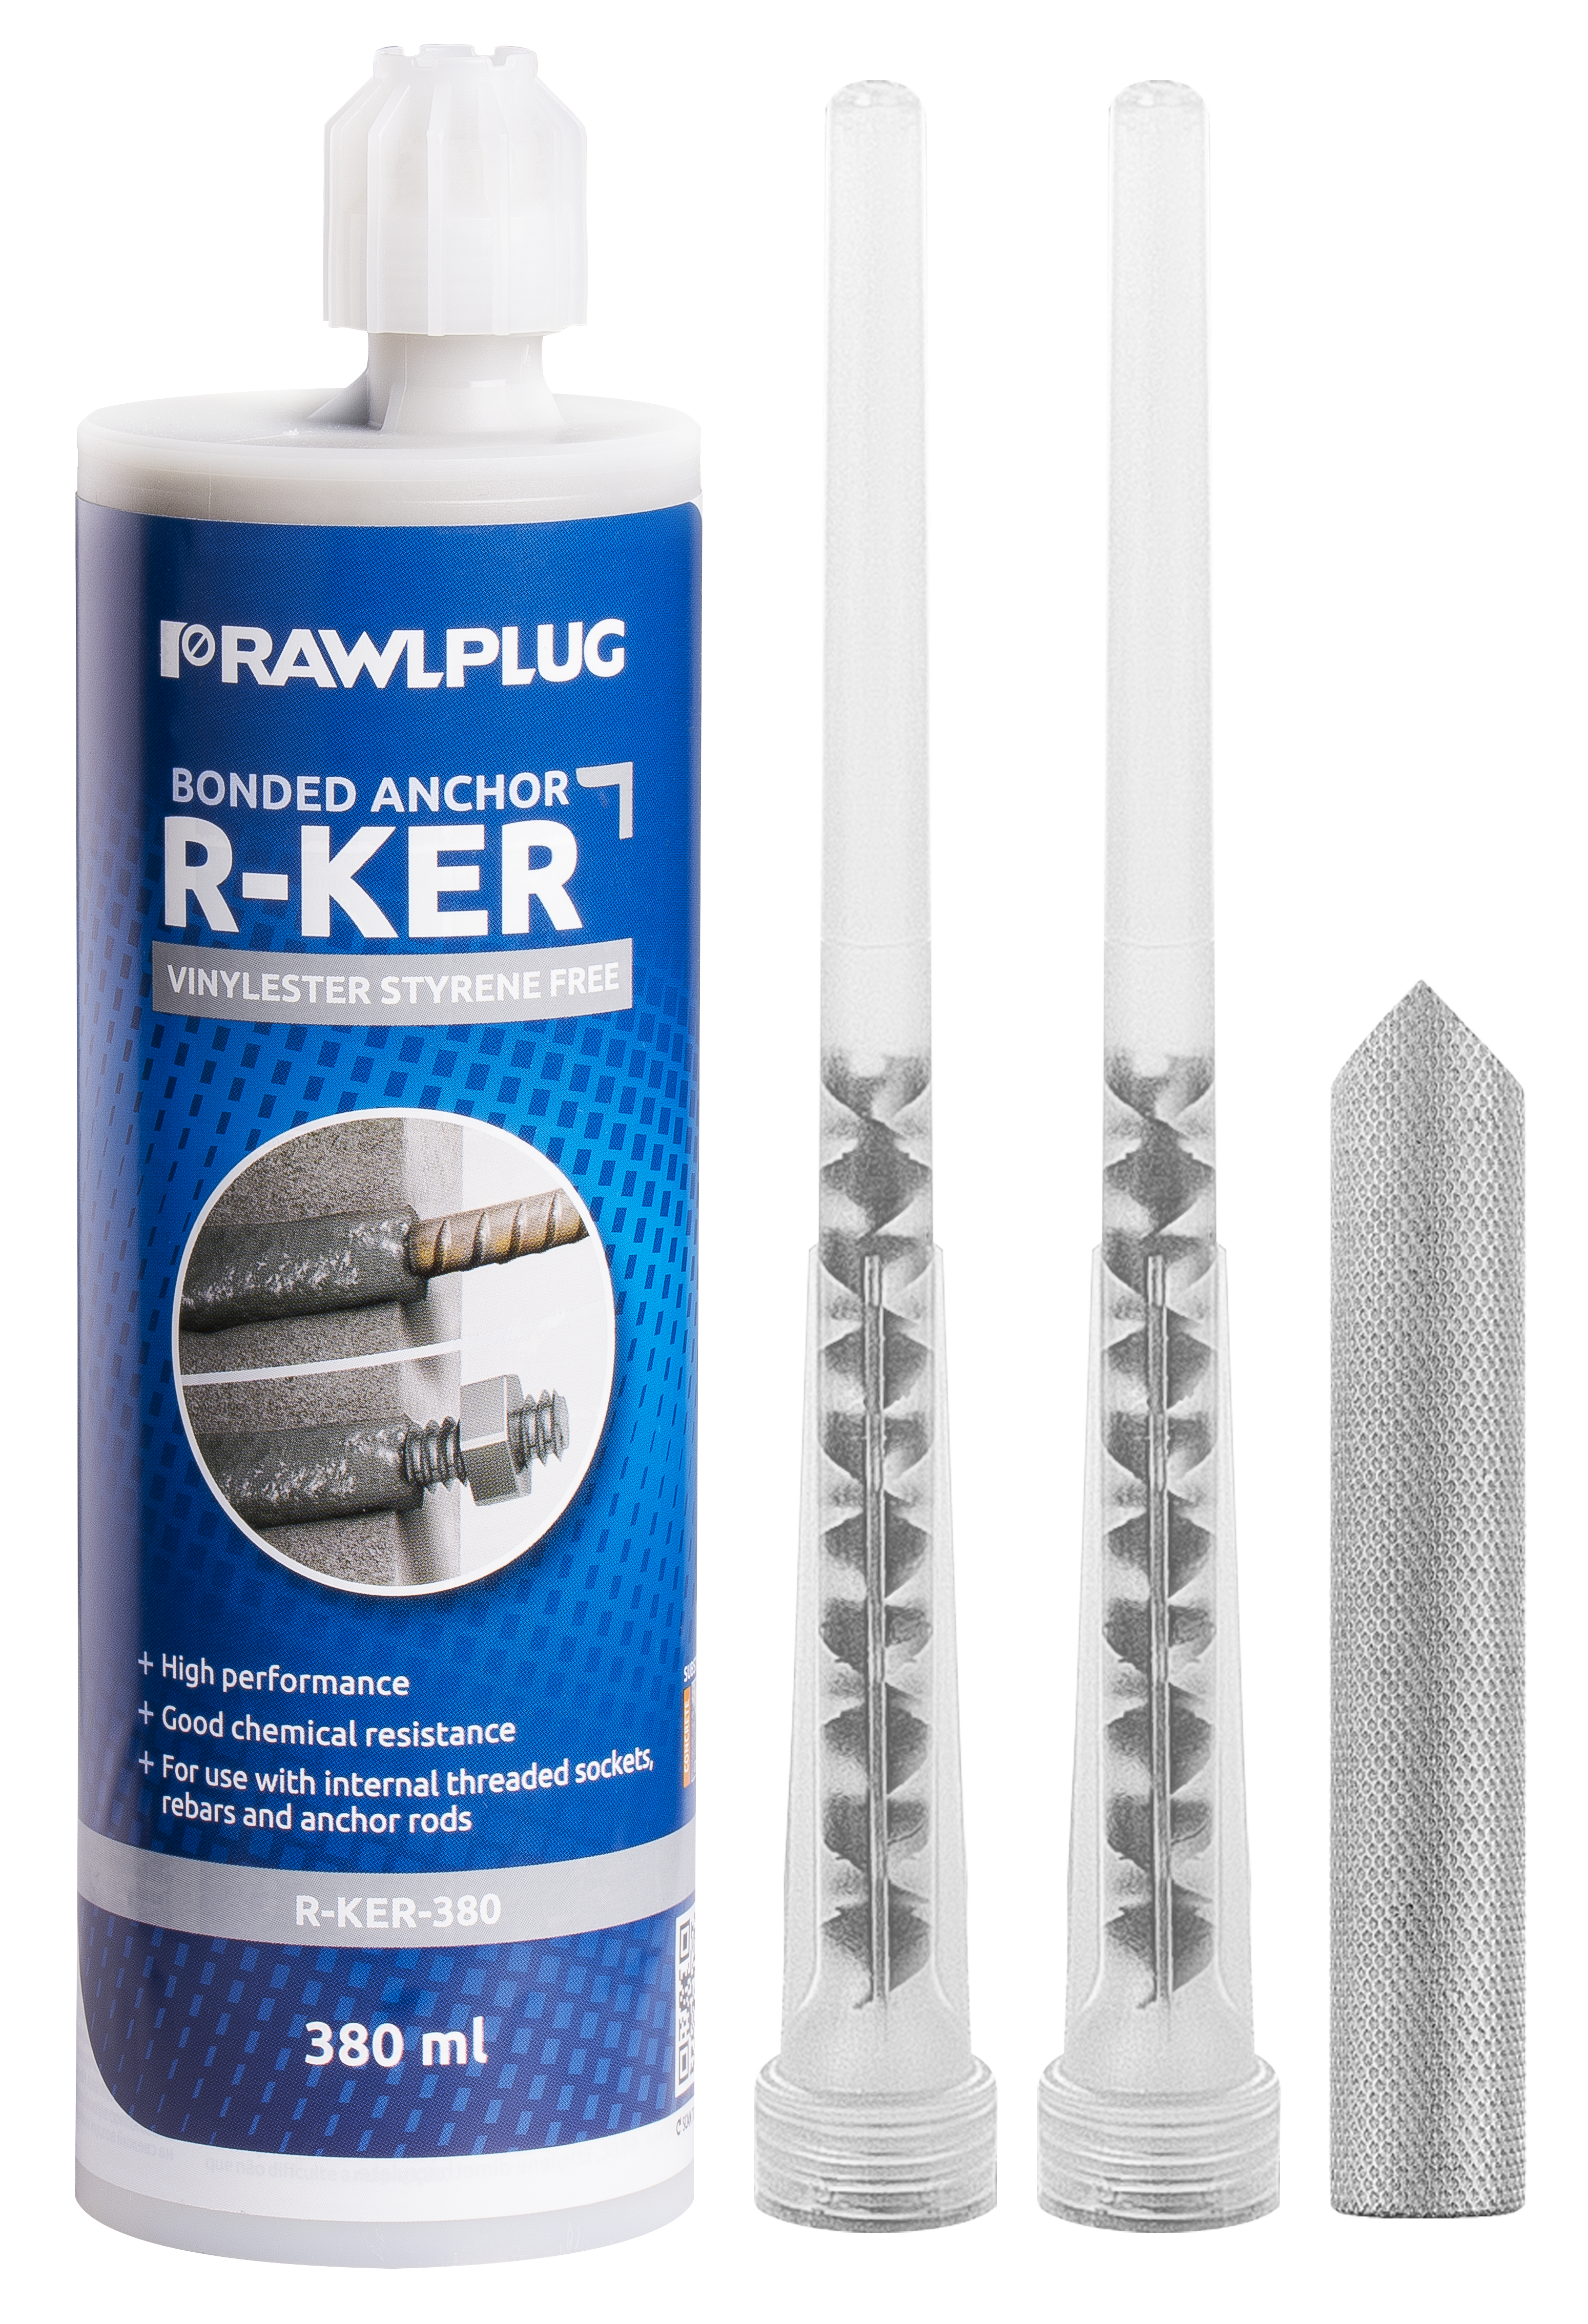 R-KER with Internally Threaded Sockets (ITS)